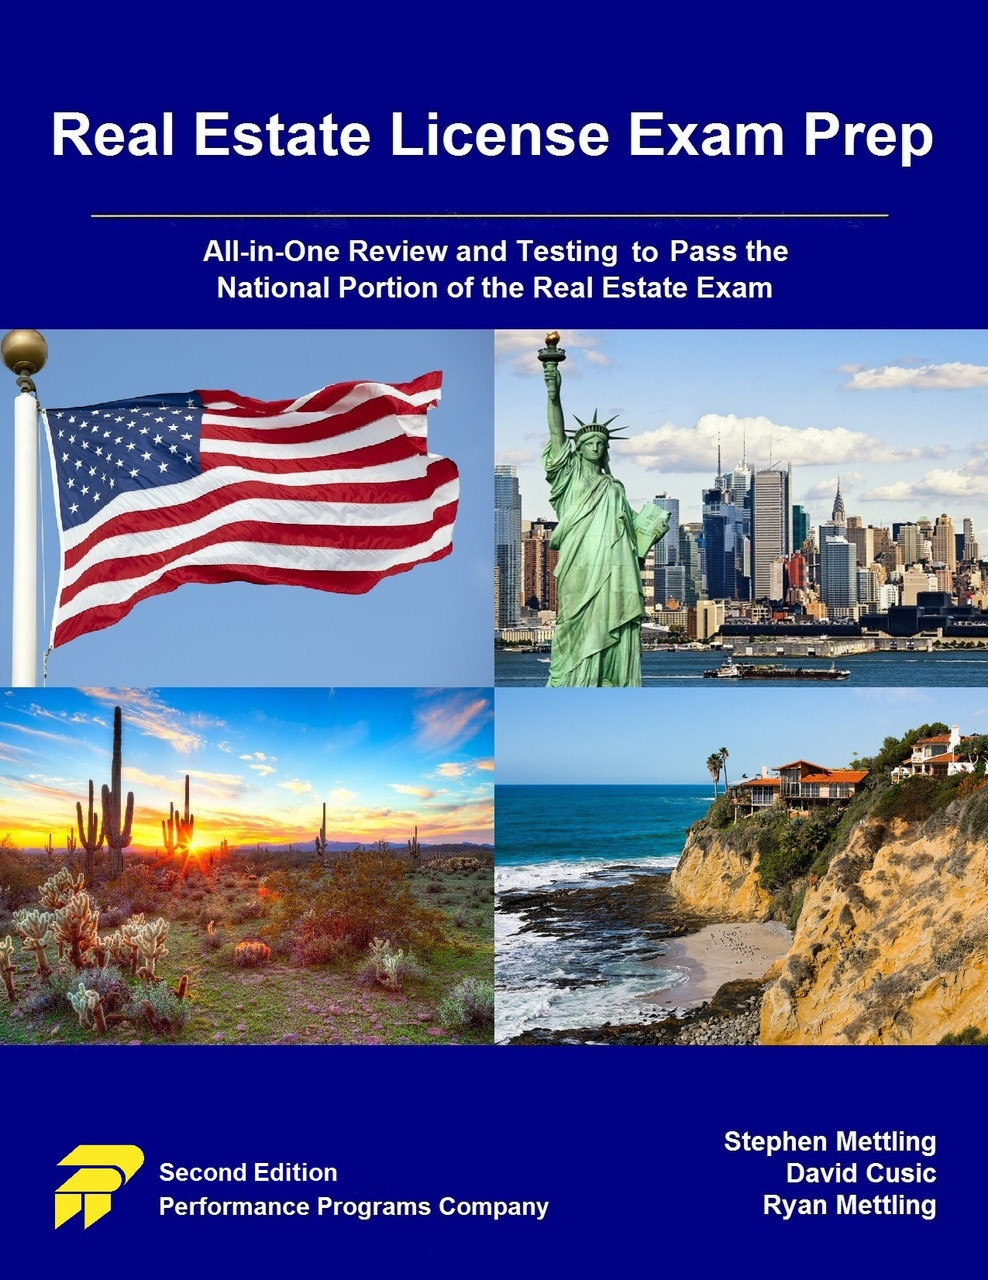 Real Estate License Exam Prep (2nd Edition) - PDF